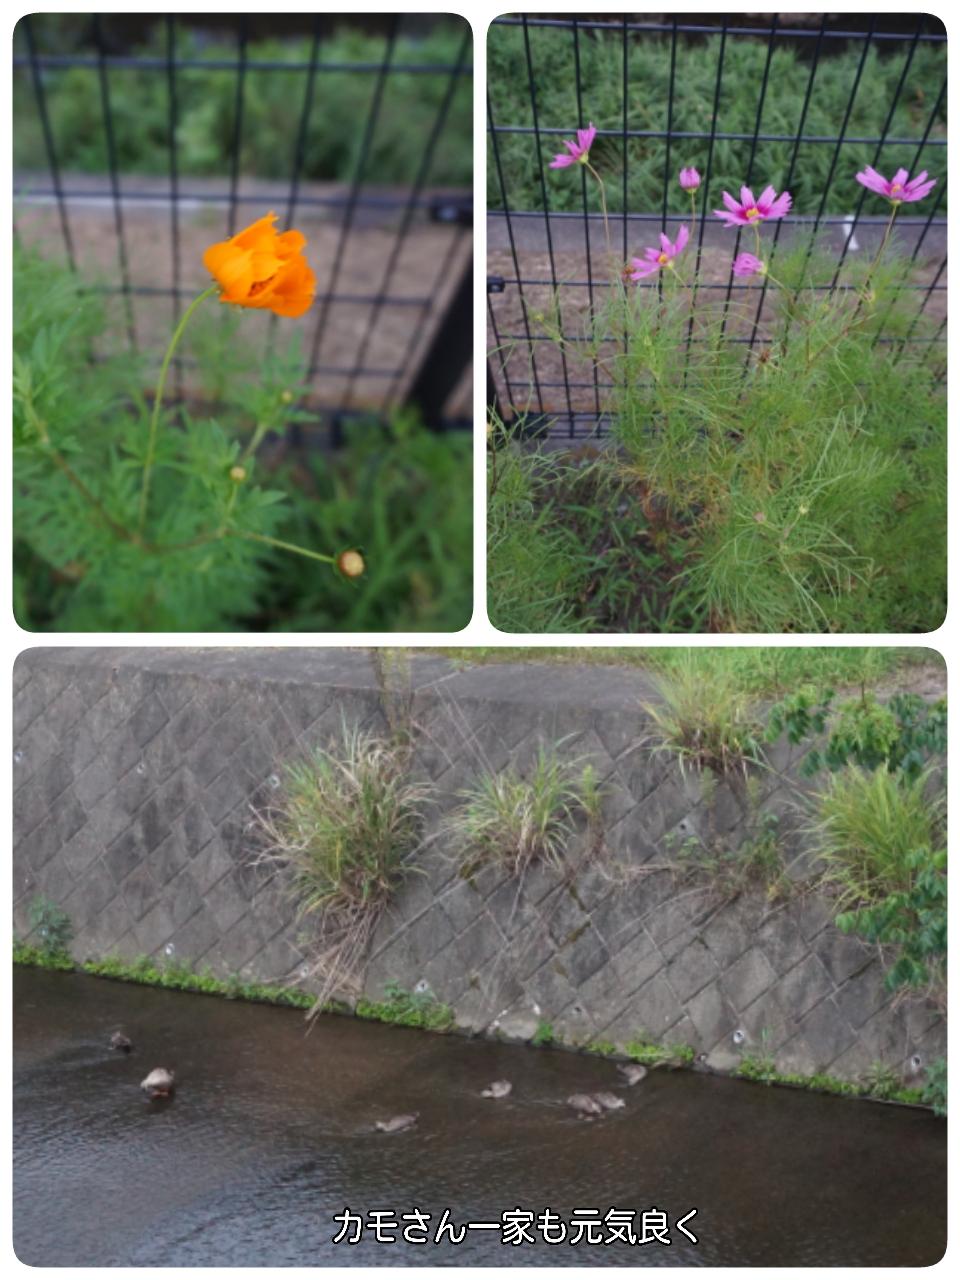 16-08-03-07-17-10-675_deco.jpg